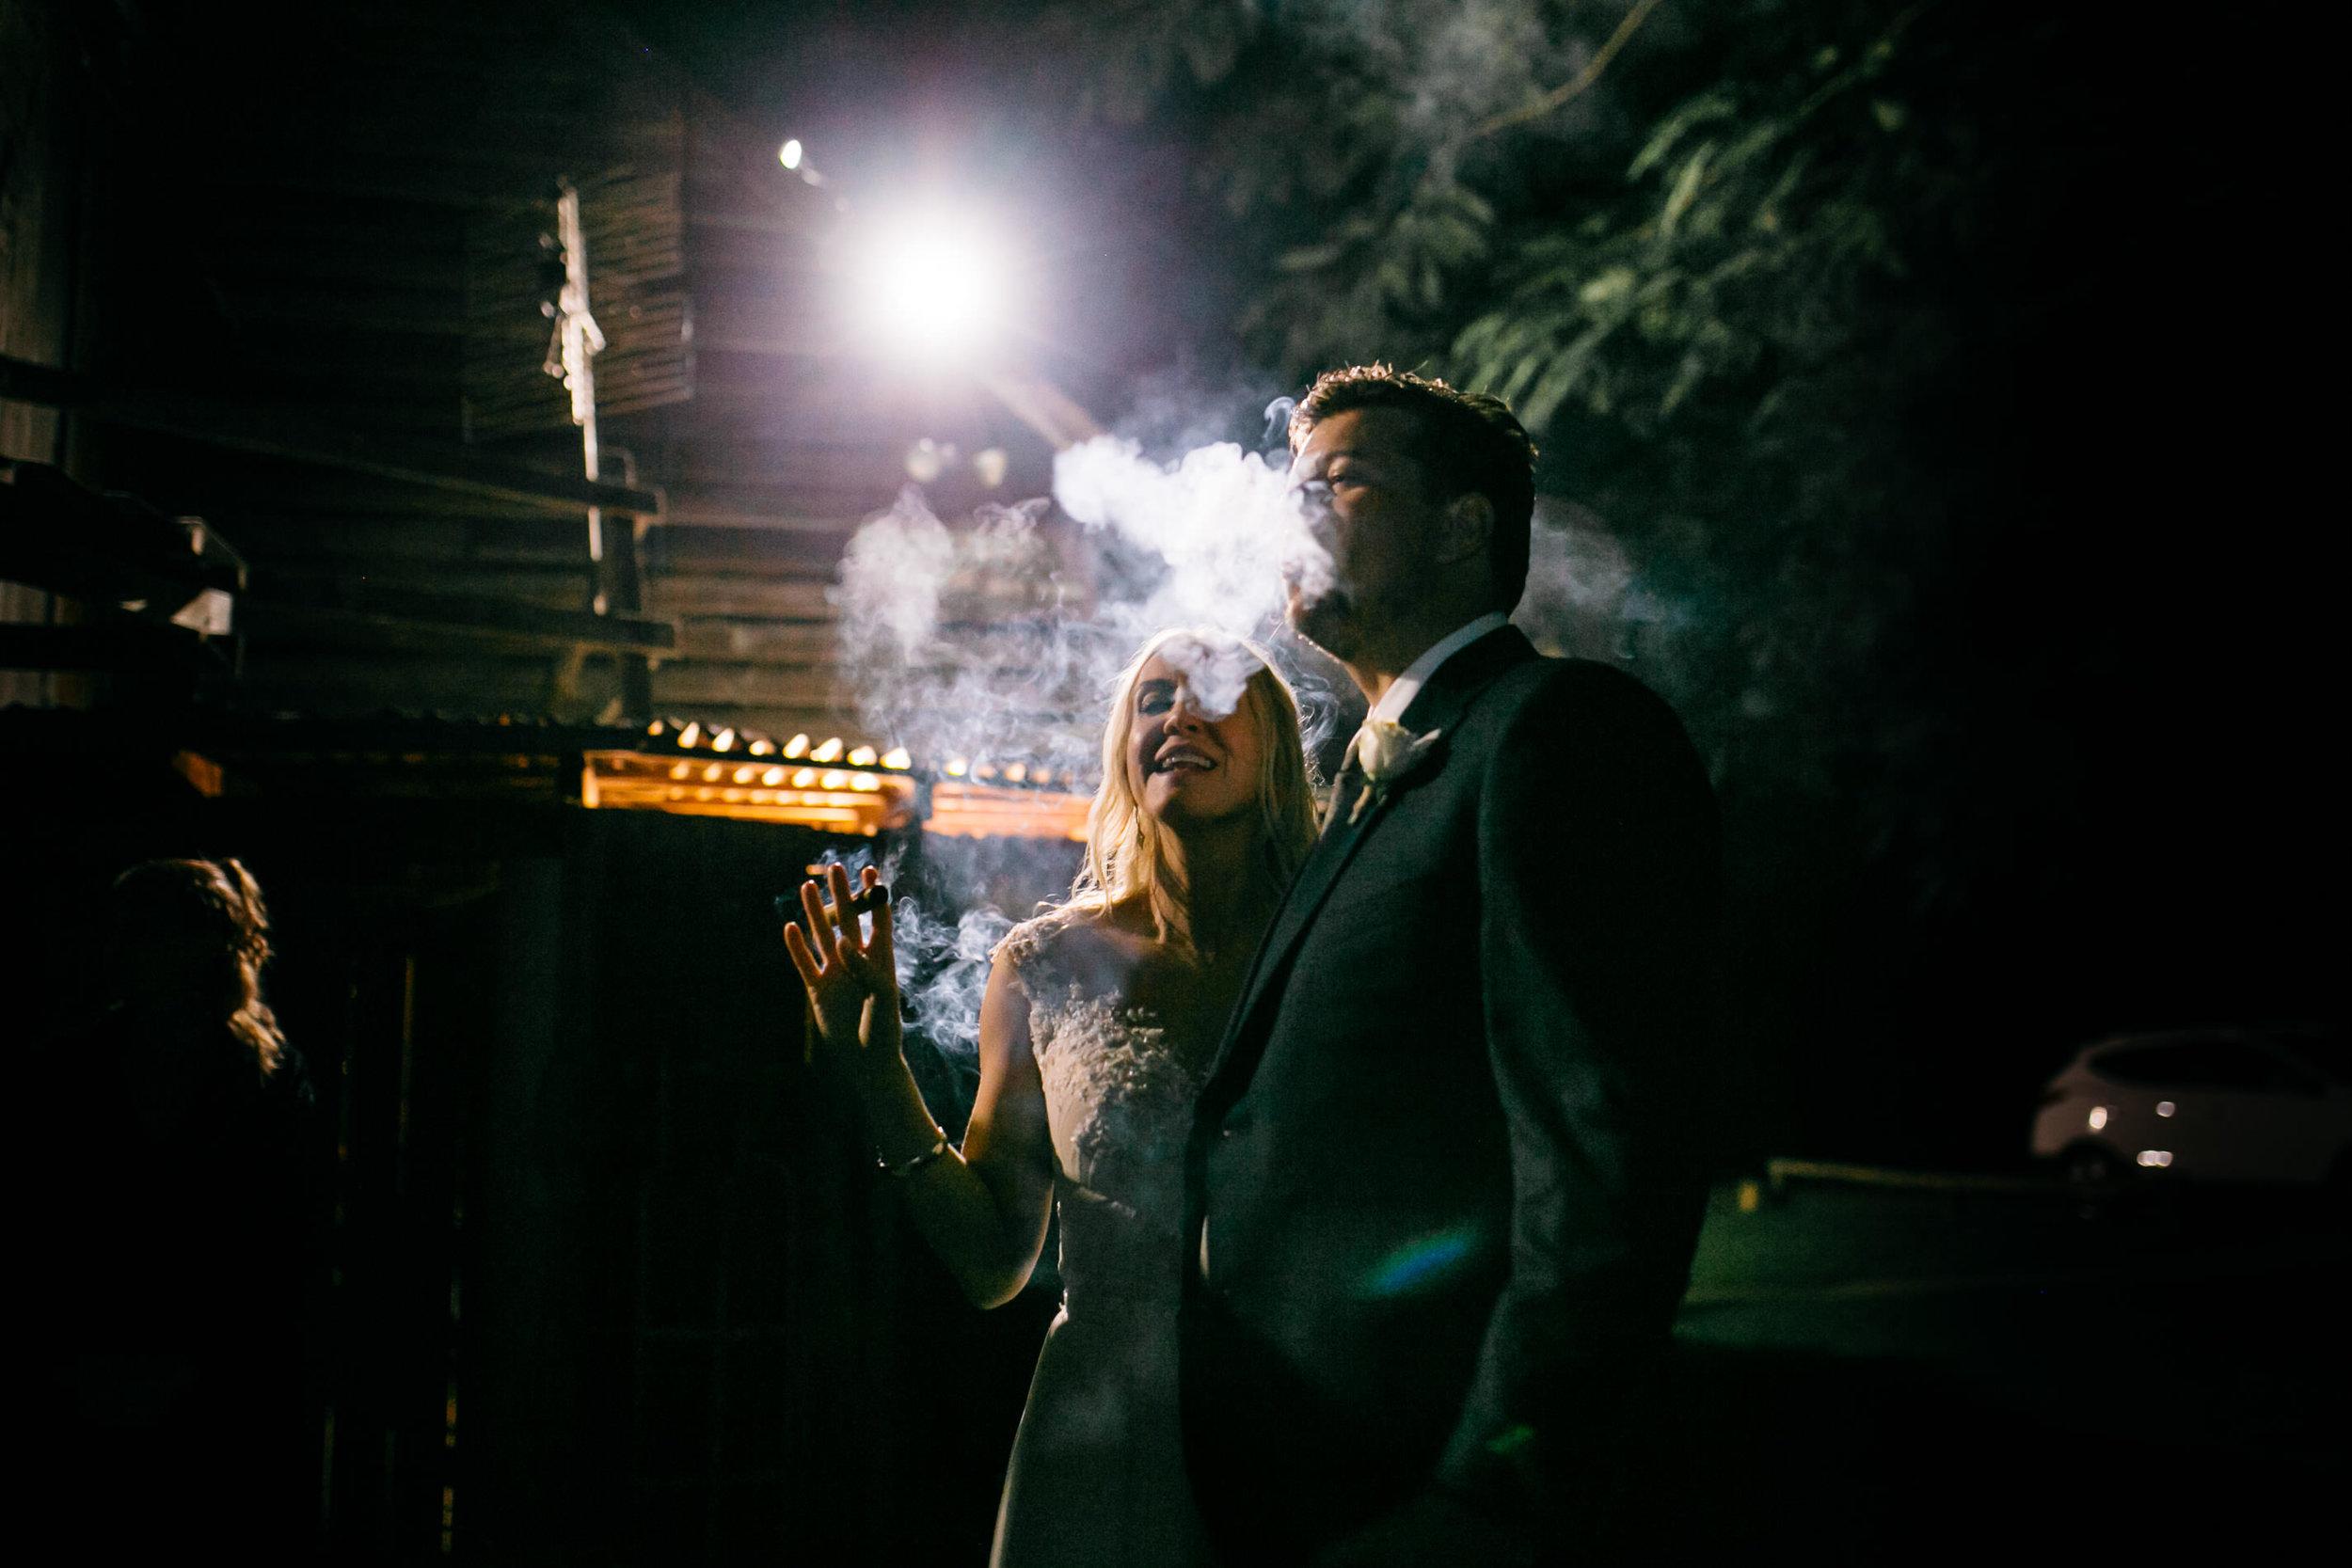 True North Photography_Boomerang Farm_Stacey and Isaac_Gold Coast Wedding_Barm Wedding_Hinterland Wedding-225.jpg